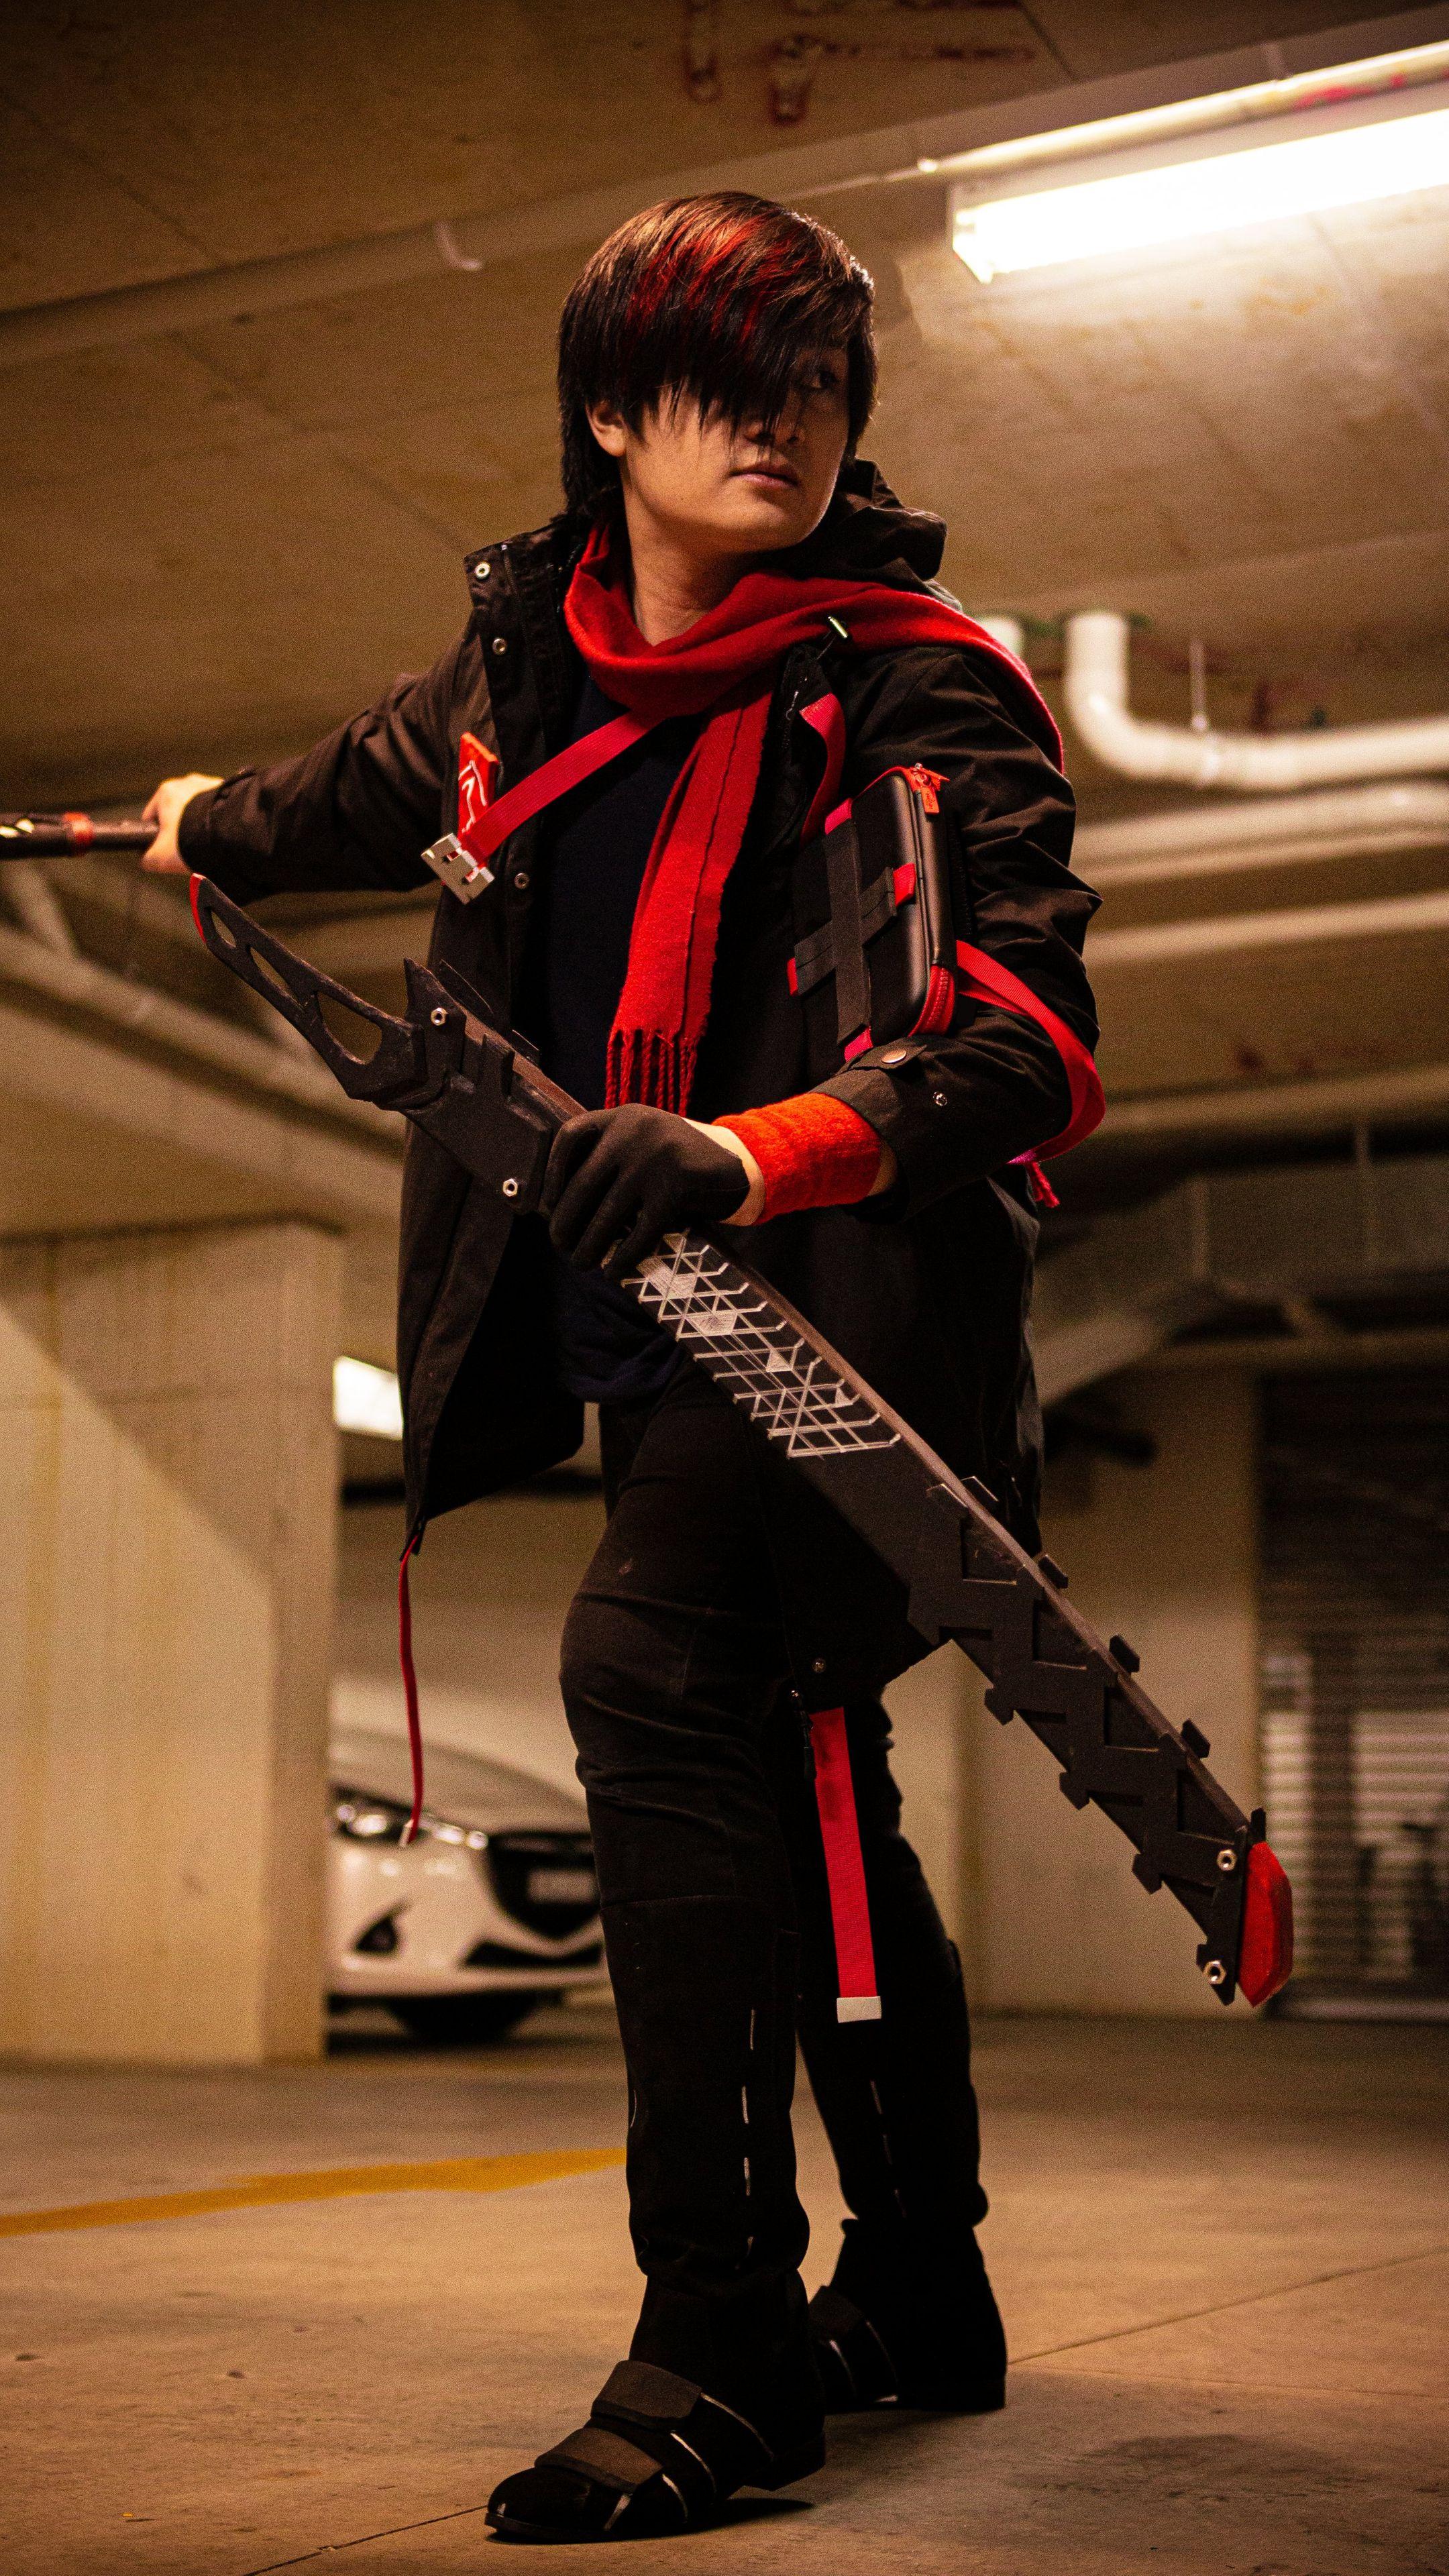 snx-cosplay-rakun04